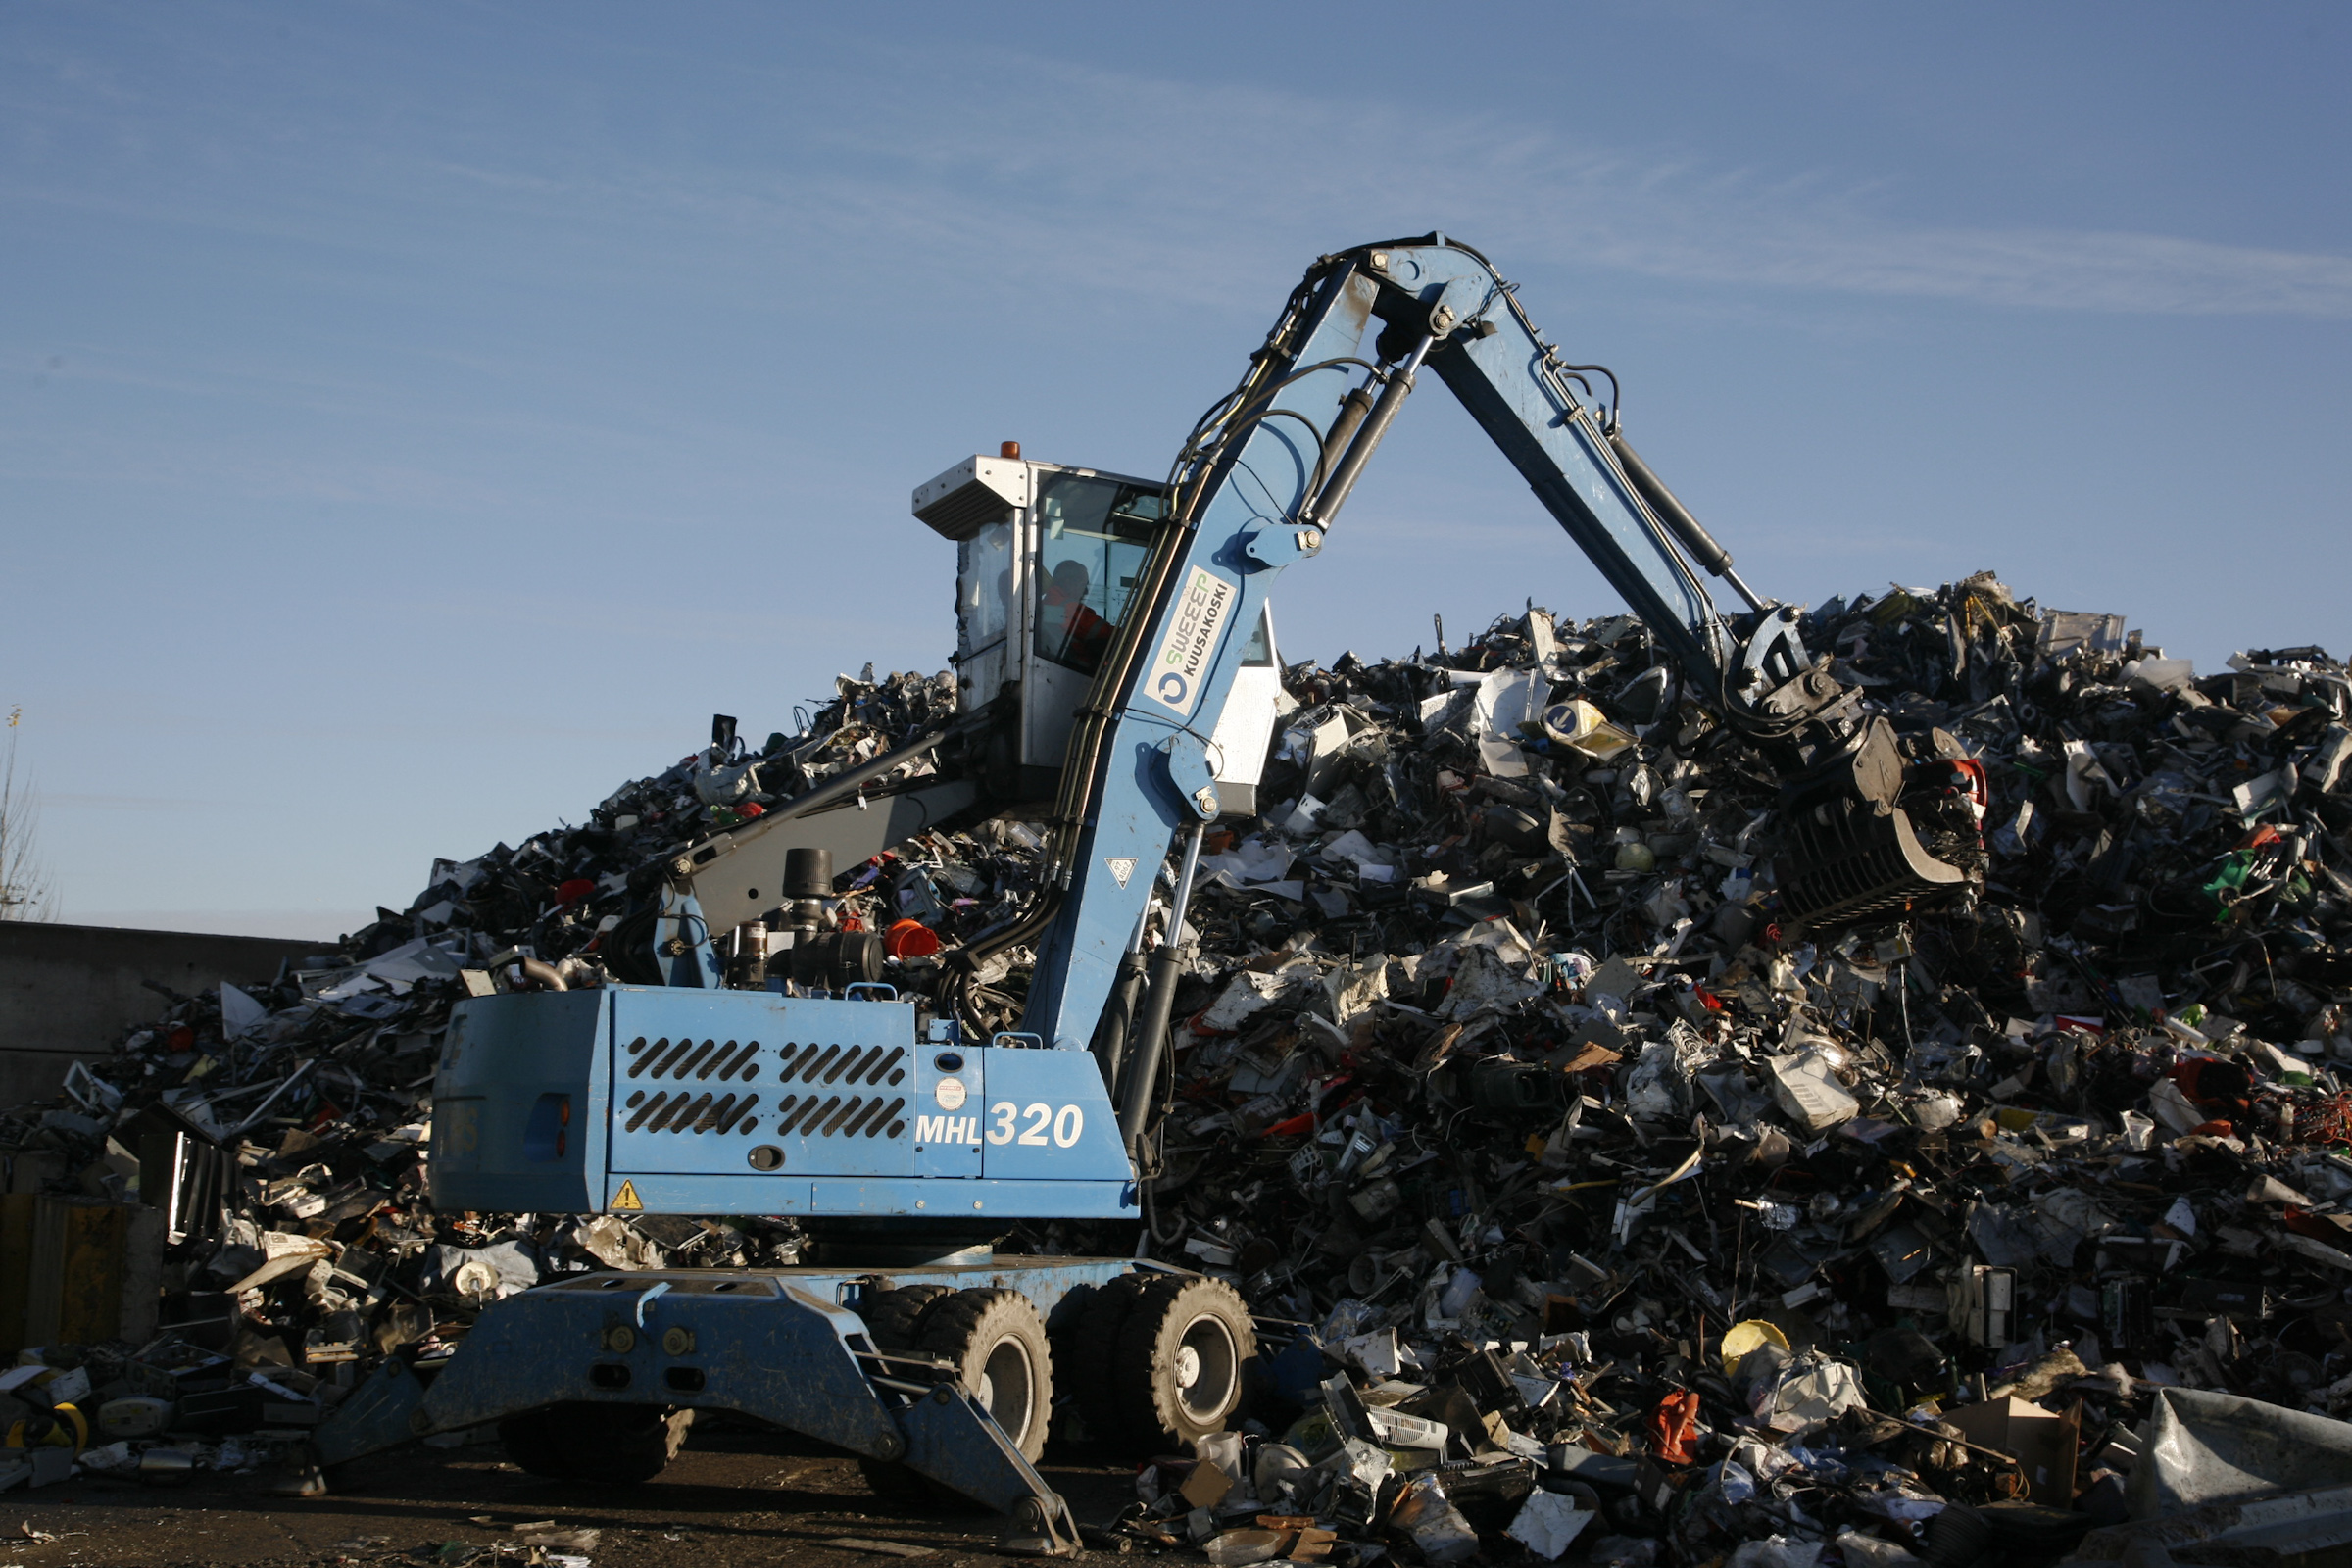 Sweeep Kuusakoski News Scrap Printed Circuit Board Recycling Equipment From Professional Aatf Forum Responds To Defras Low Ambition Weee Targets